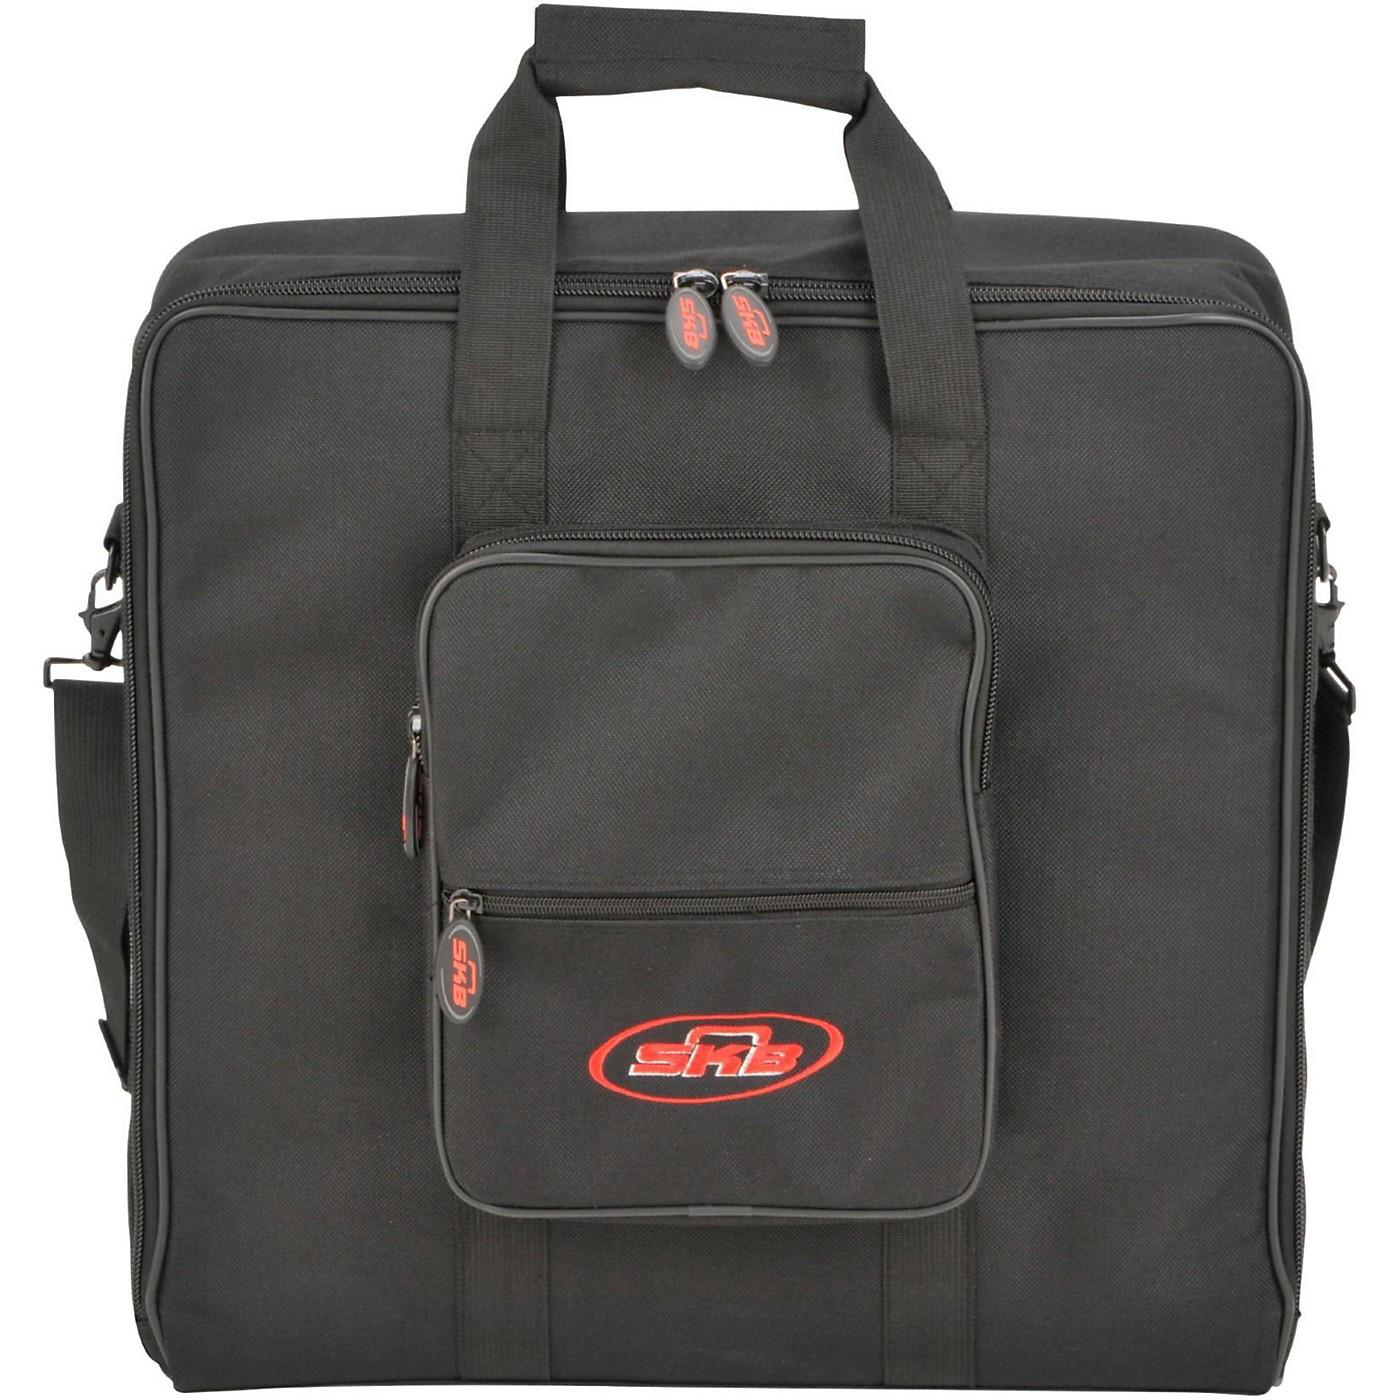 SKB Universal Equipment/Mixer Bag 18